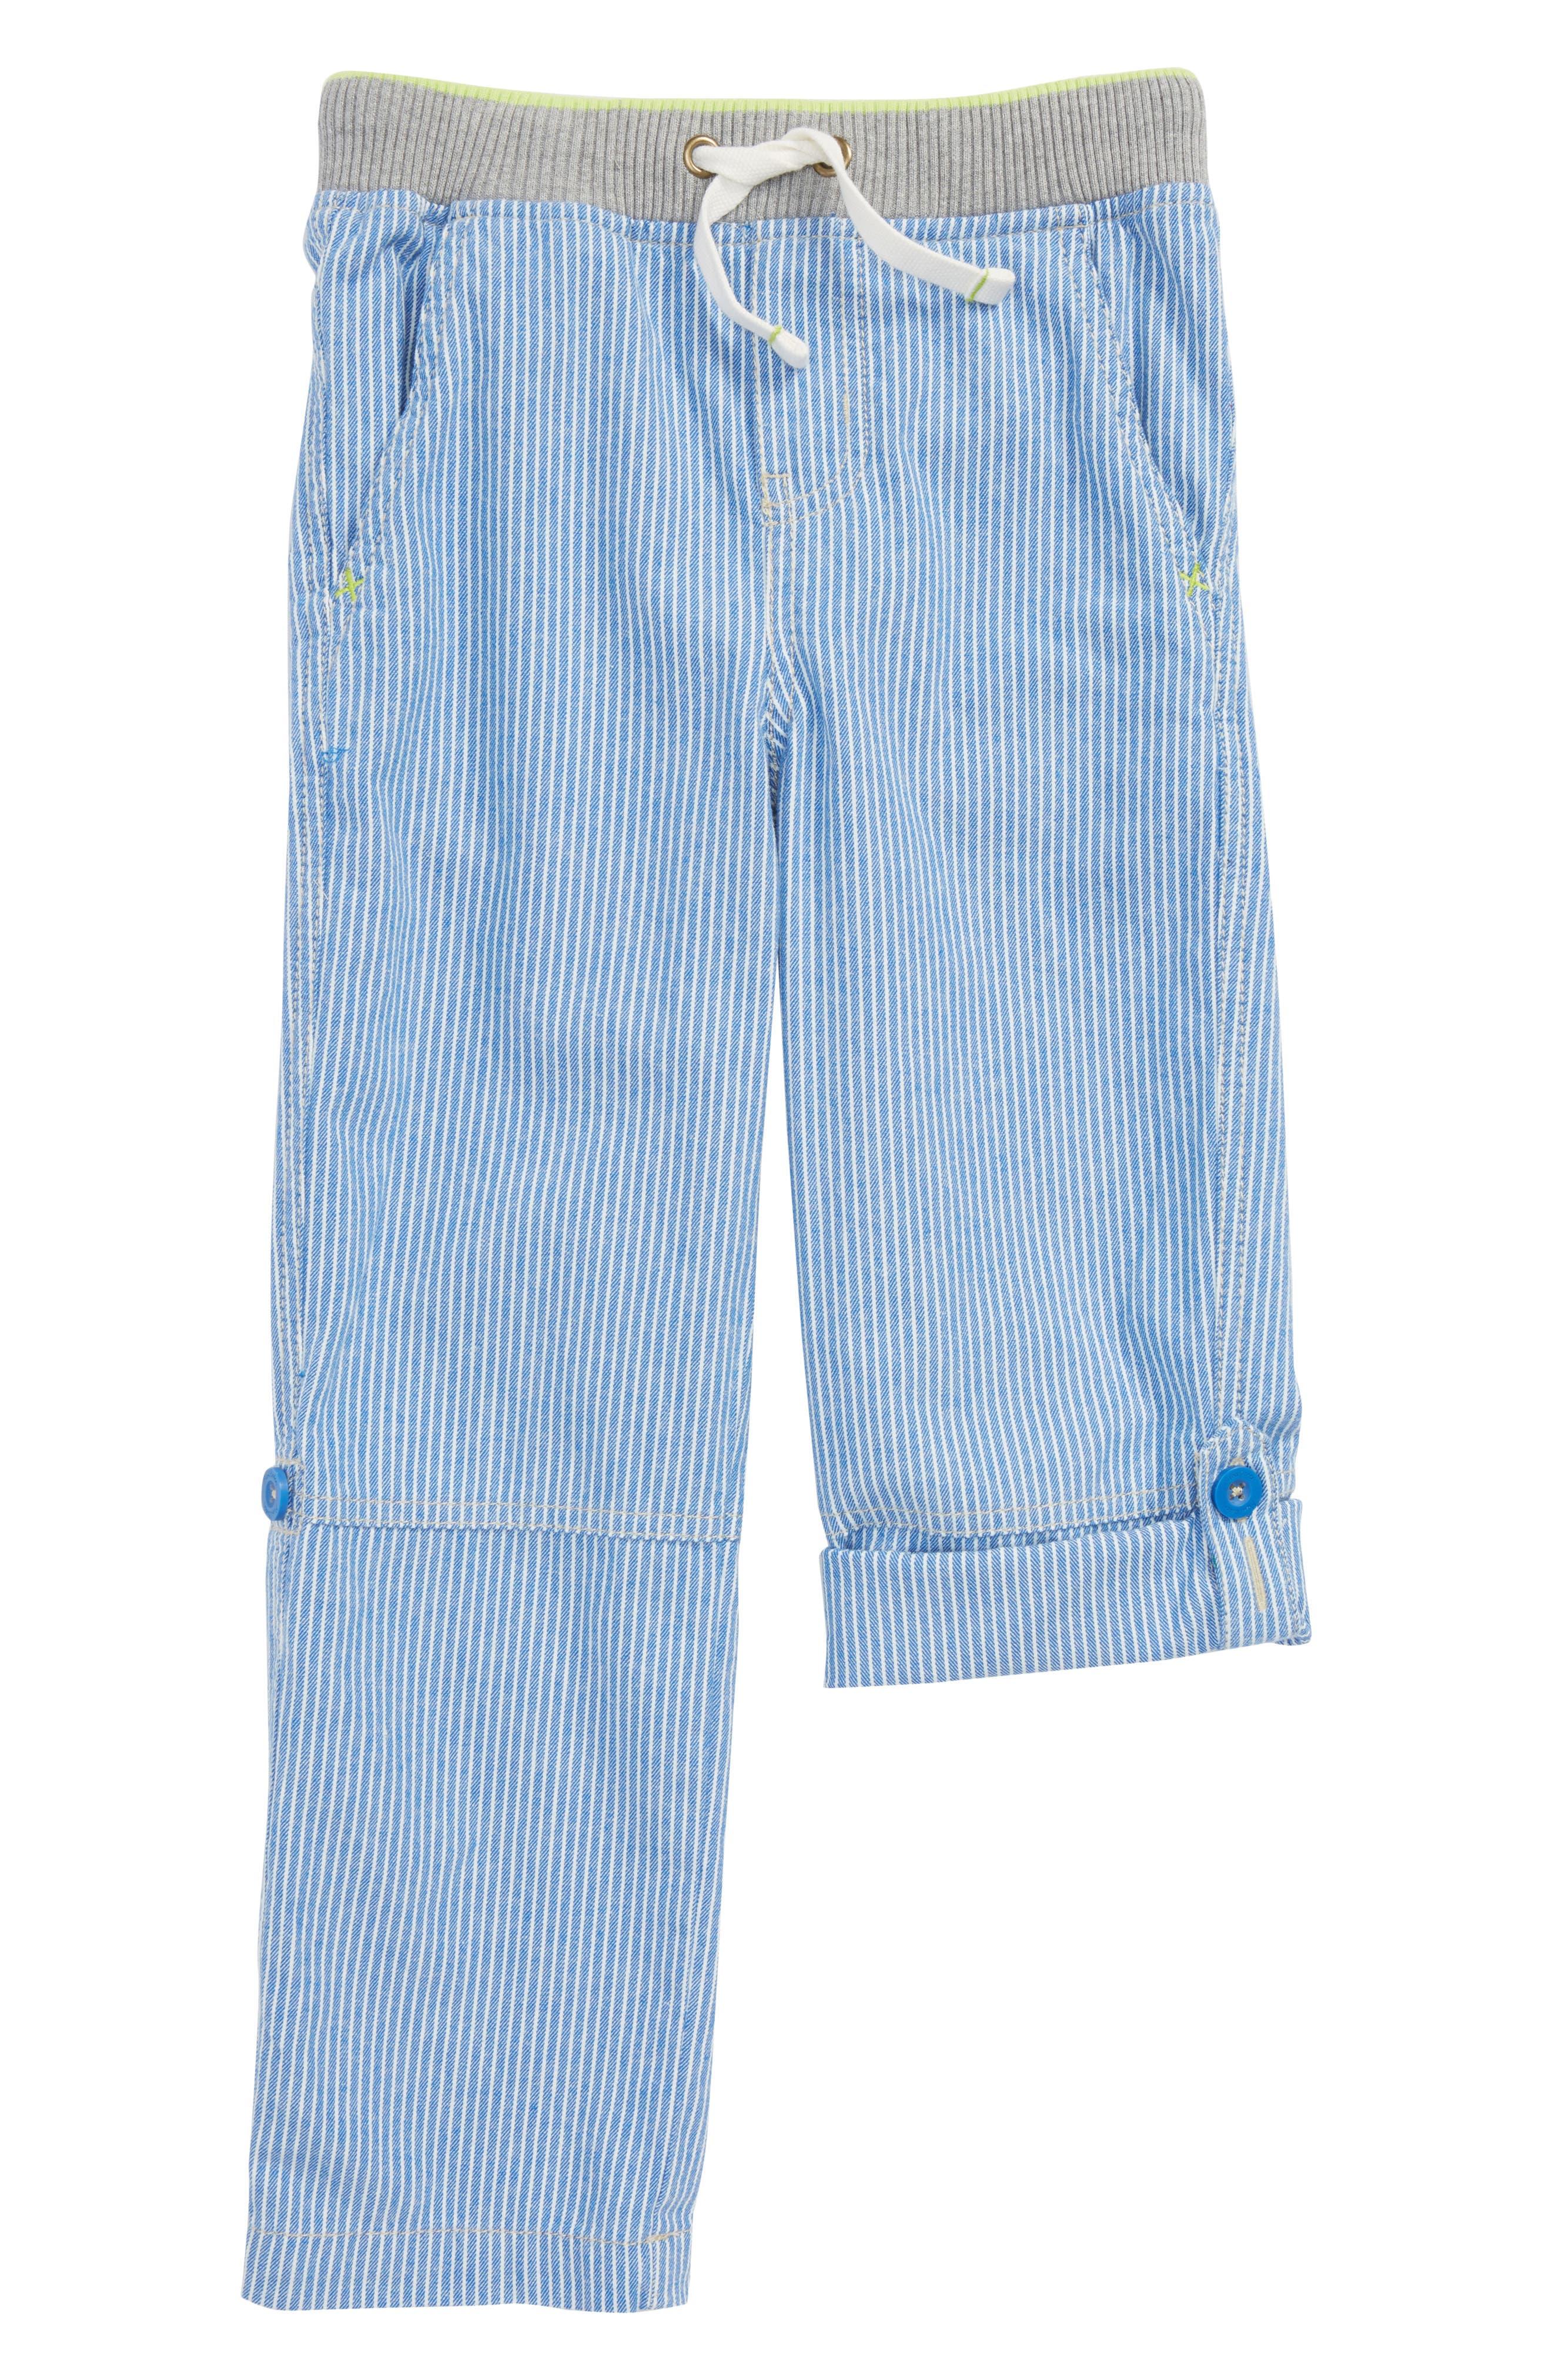 Surf Roll-Up Pants,                             Main thumbnail 1, color,                             Skipper Blue/ Ecru